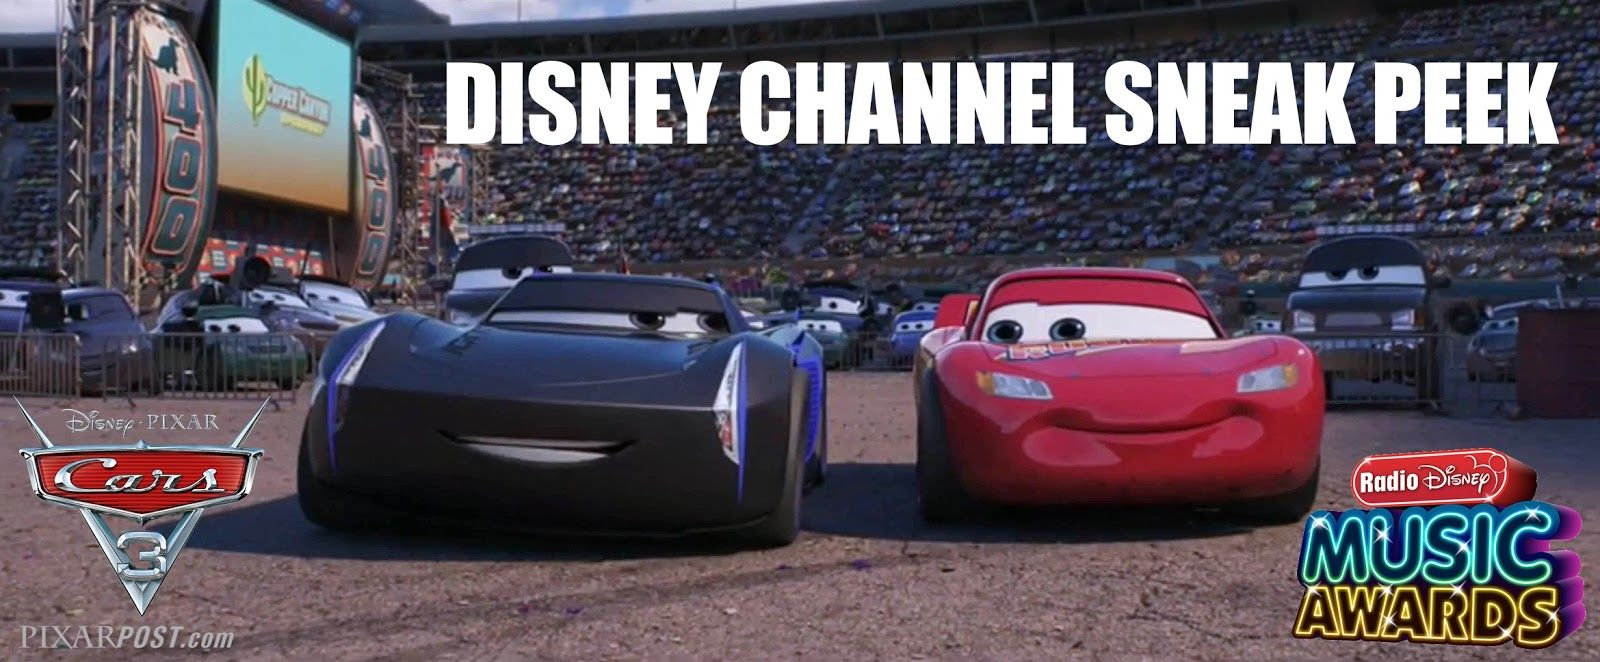 cars 3 disney channel sneak peek trailer airs during the radio